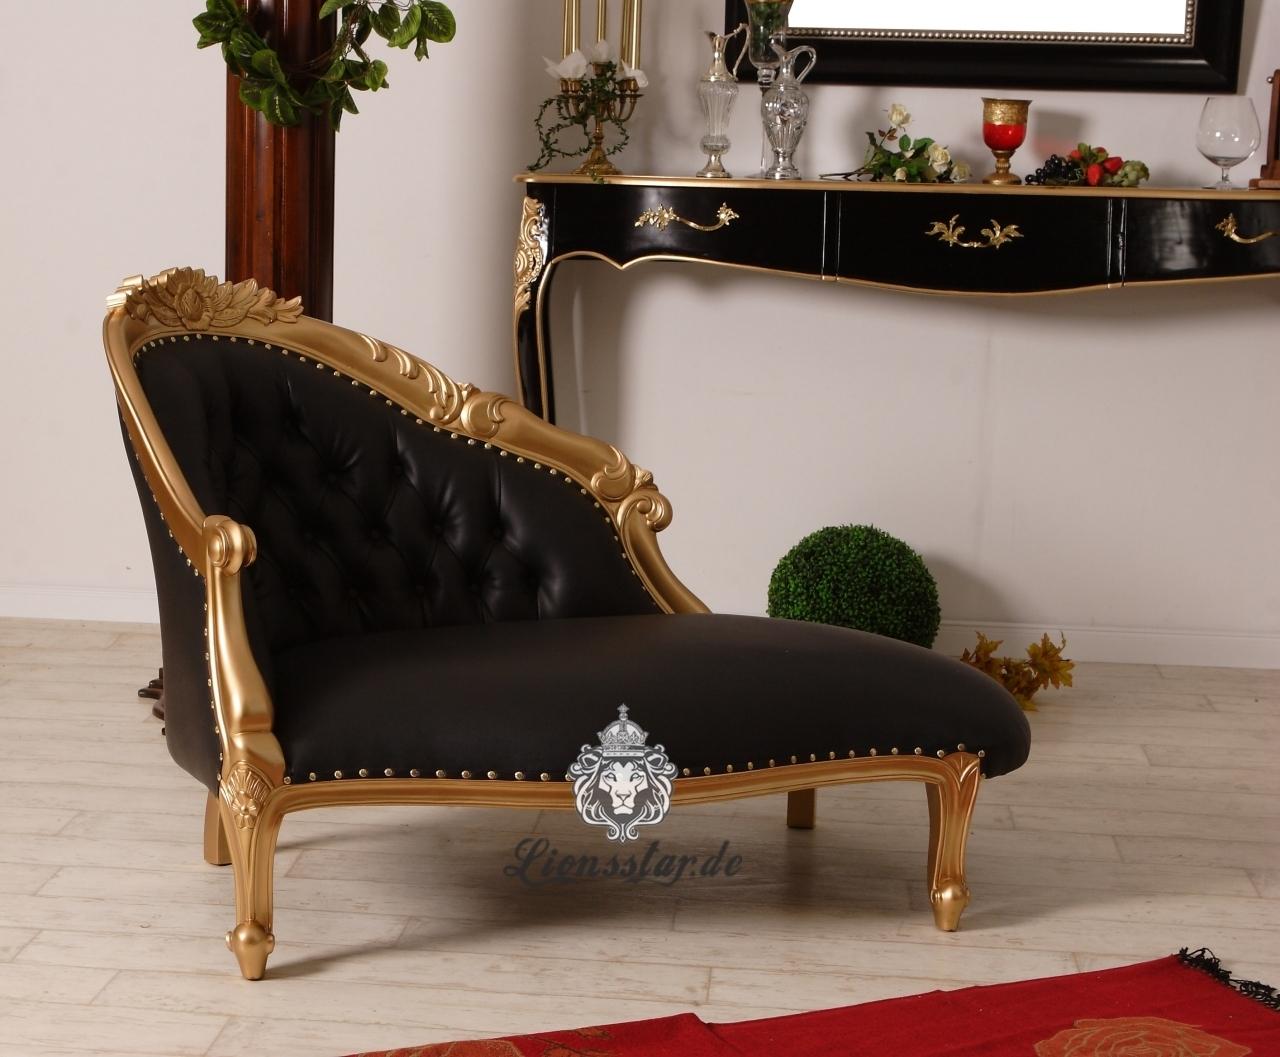 Full Size of Recamiere Barock Boudoir Diplomatie Rot Chaiselongue Sofa Mit Bett Wohnzimmer Recamiere Barock